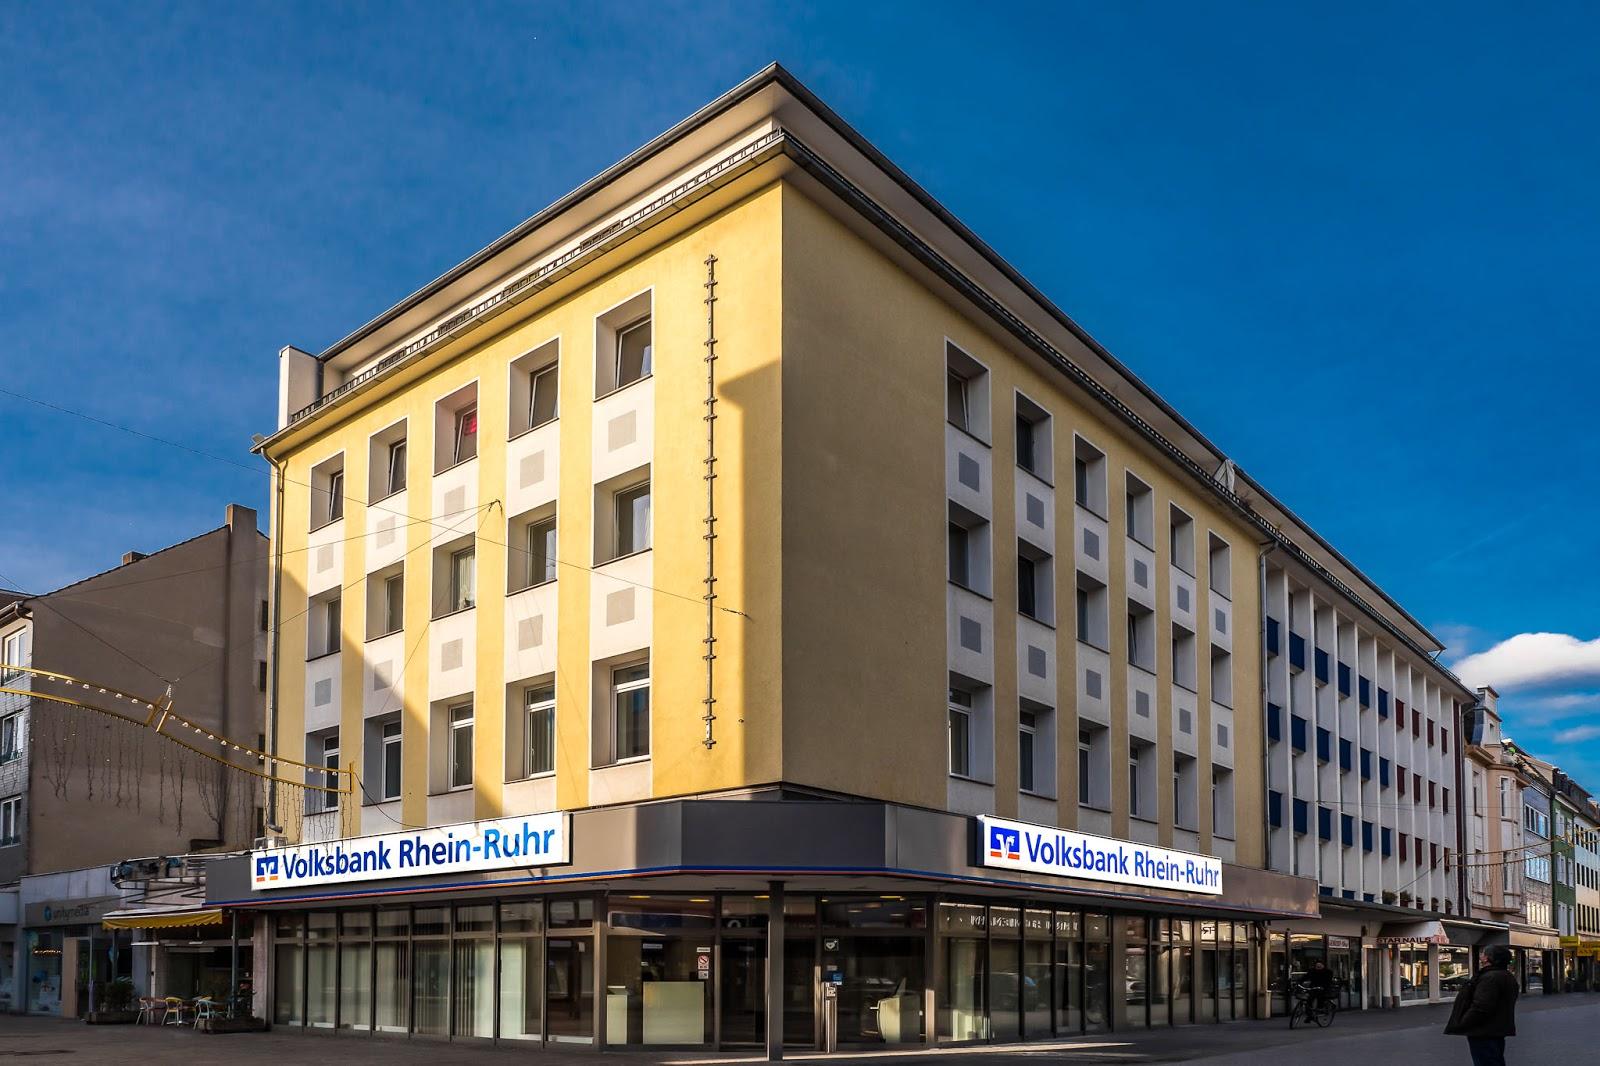 oberhausen ruhr centro metropole aufwertung in oberhausen endlich marktstra en. Black Bedroom Furniture Sets. Home Design Ideas